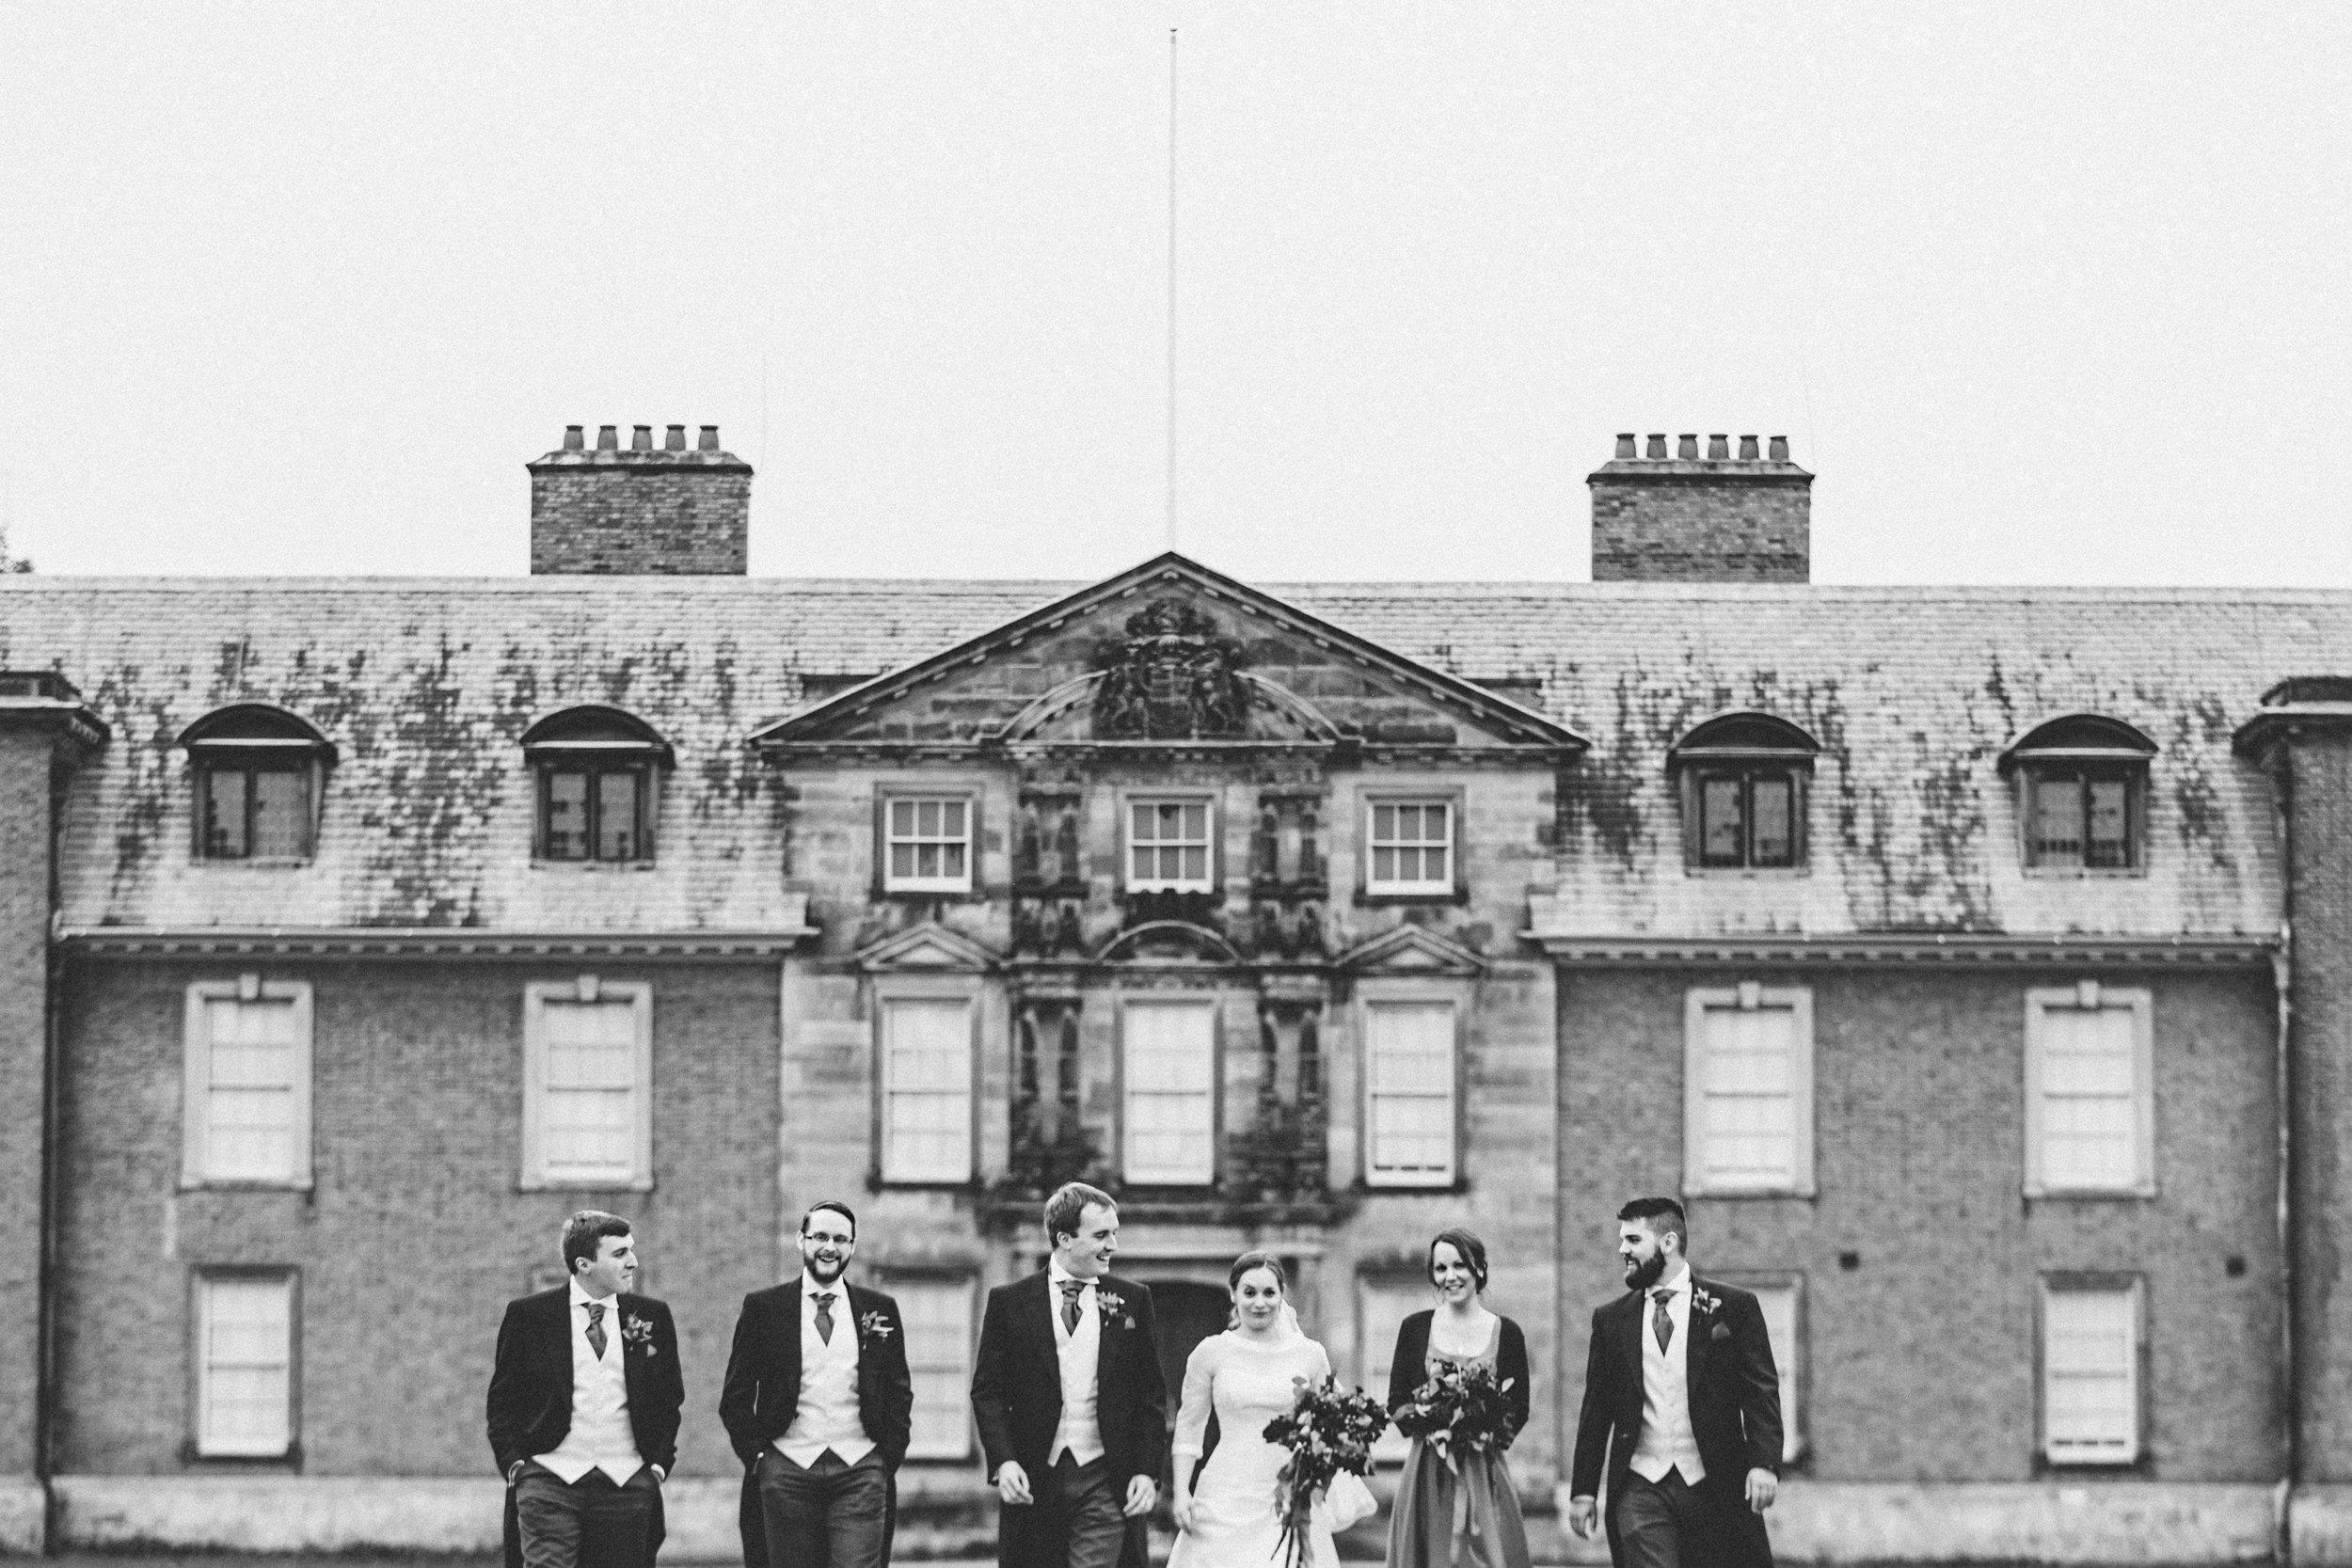 Dunham-Massey-Wedding-Photographer-84.jpg